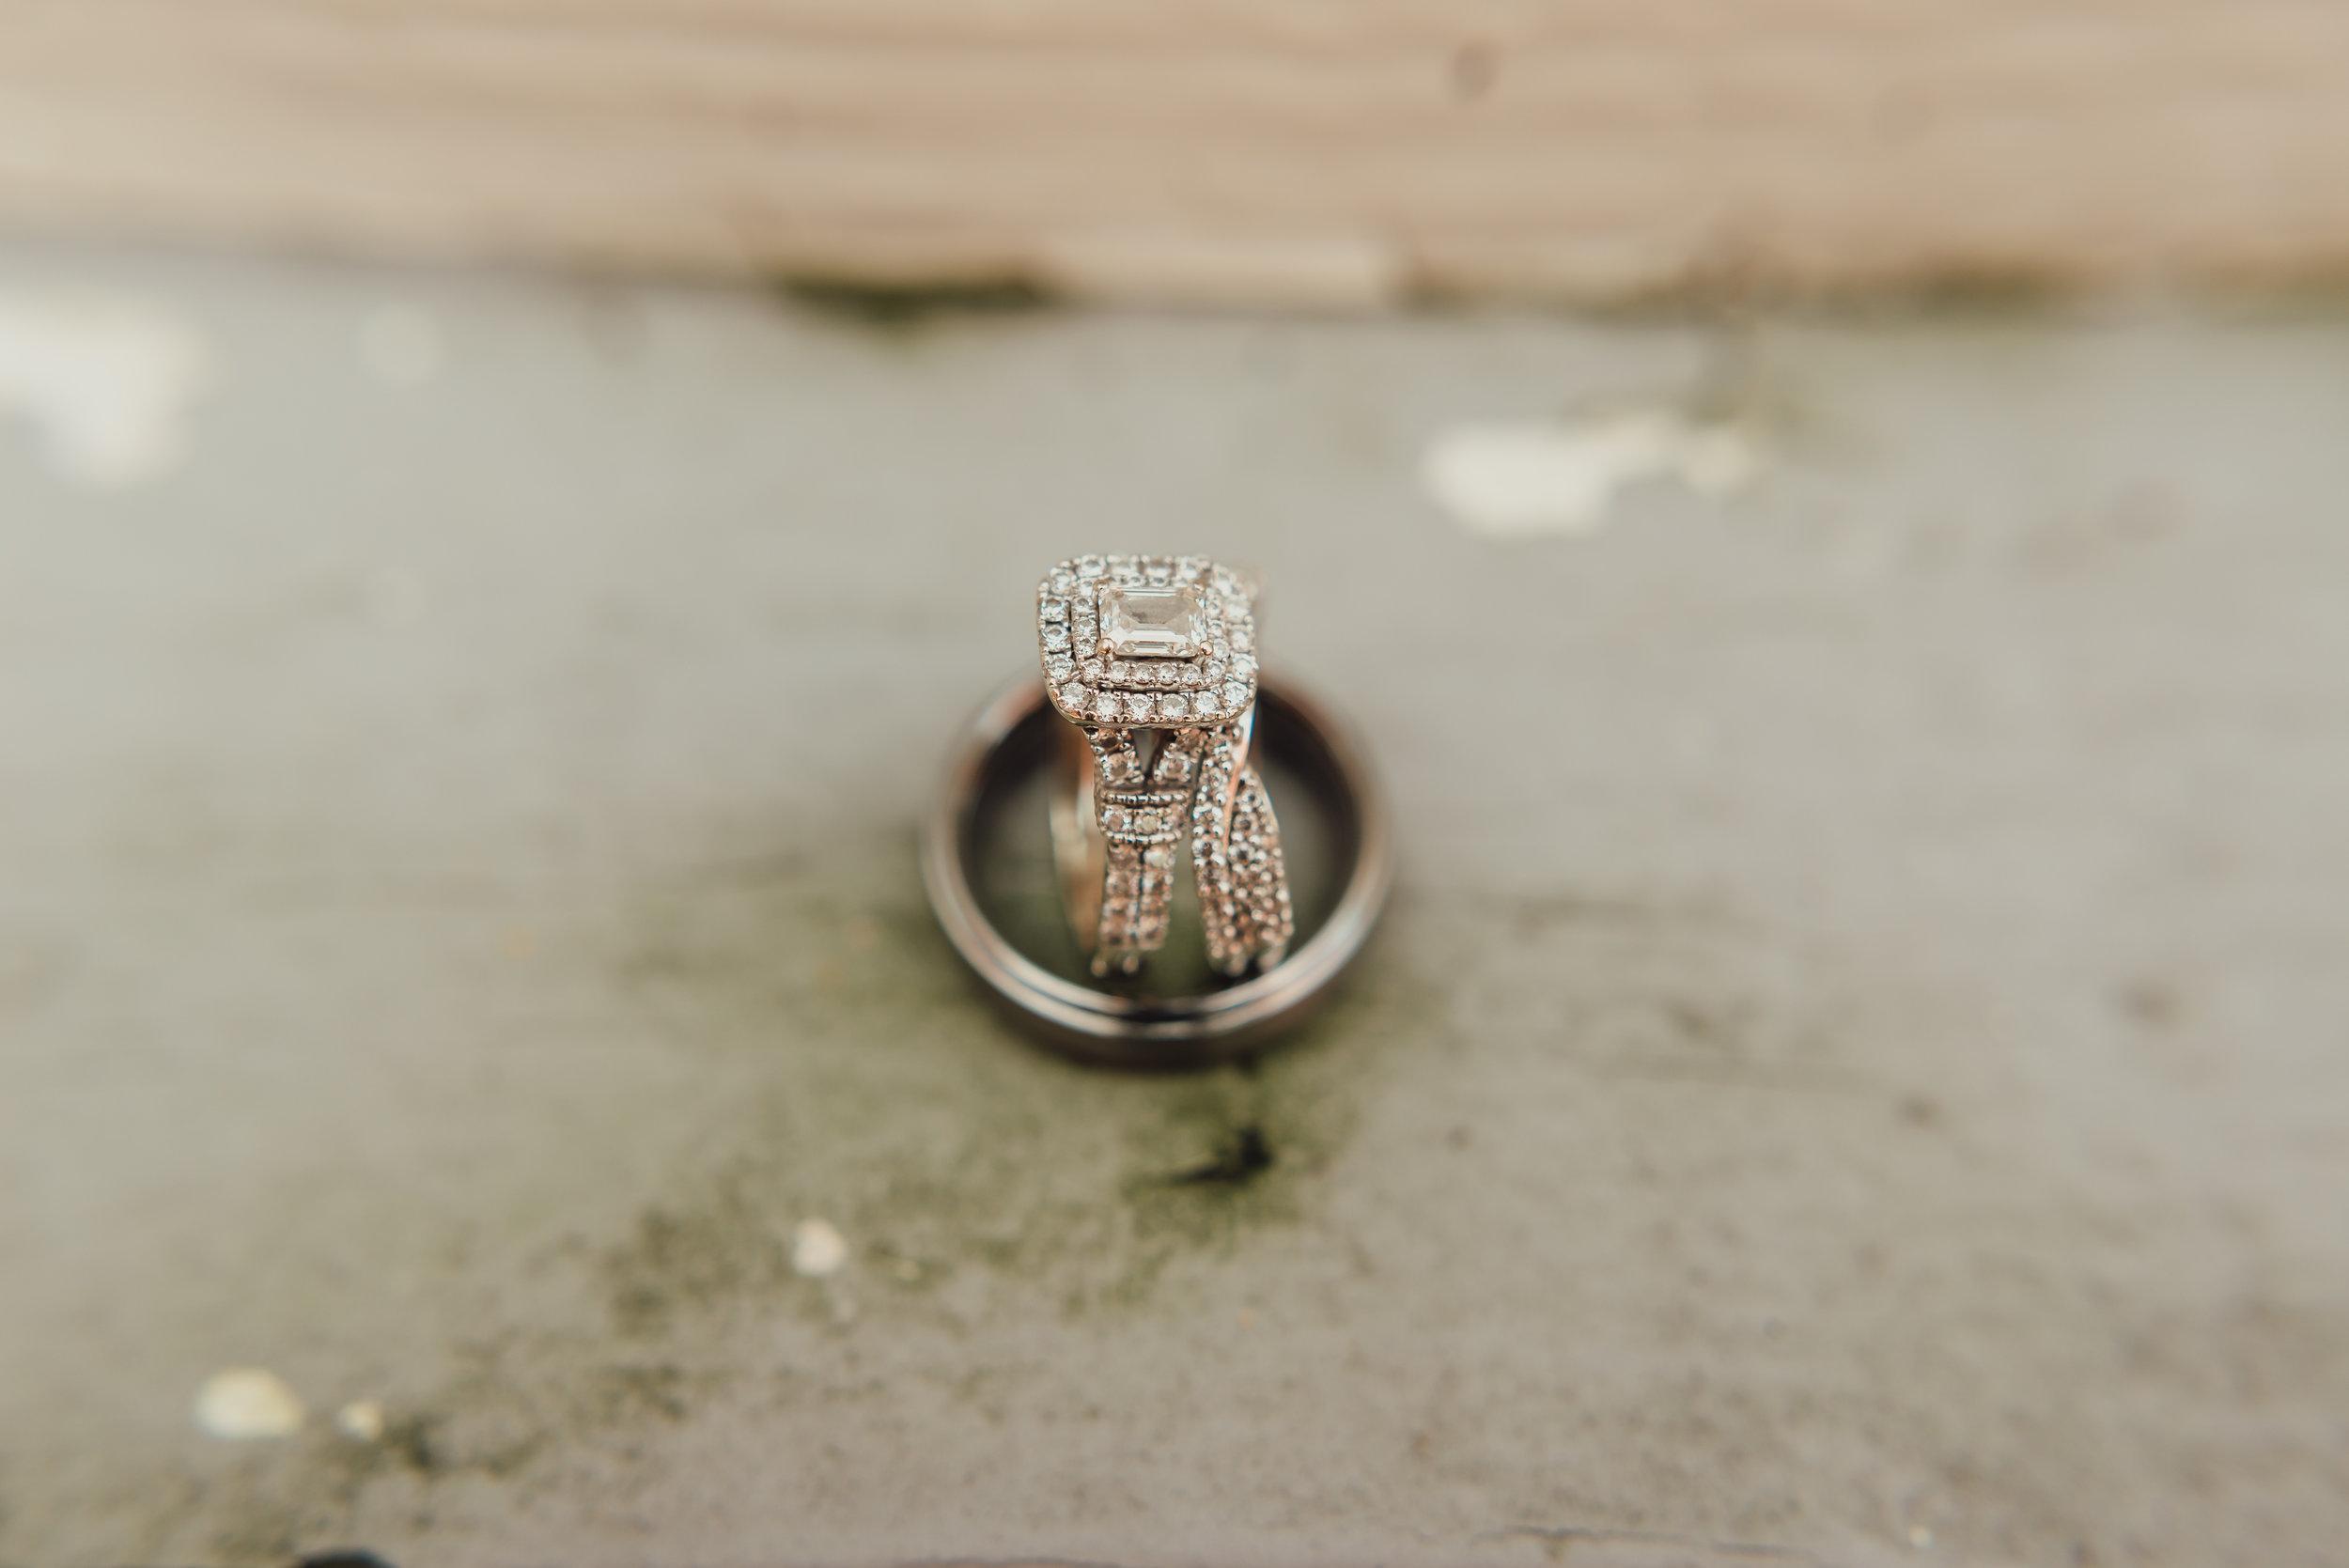 east-tn-wedding-photographer-tennessee-elopement-photographer-kingsport-tn-wedding-photographer (29 of 1001).jpg